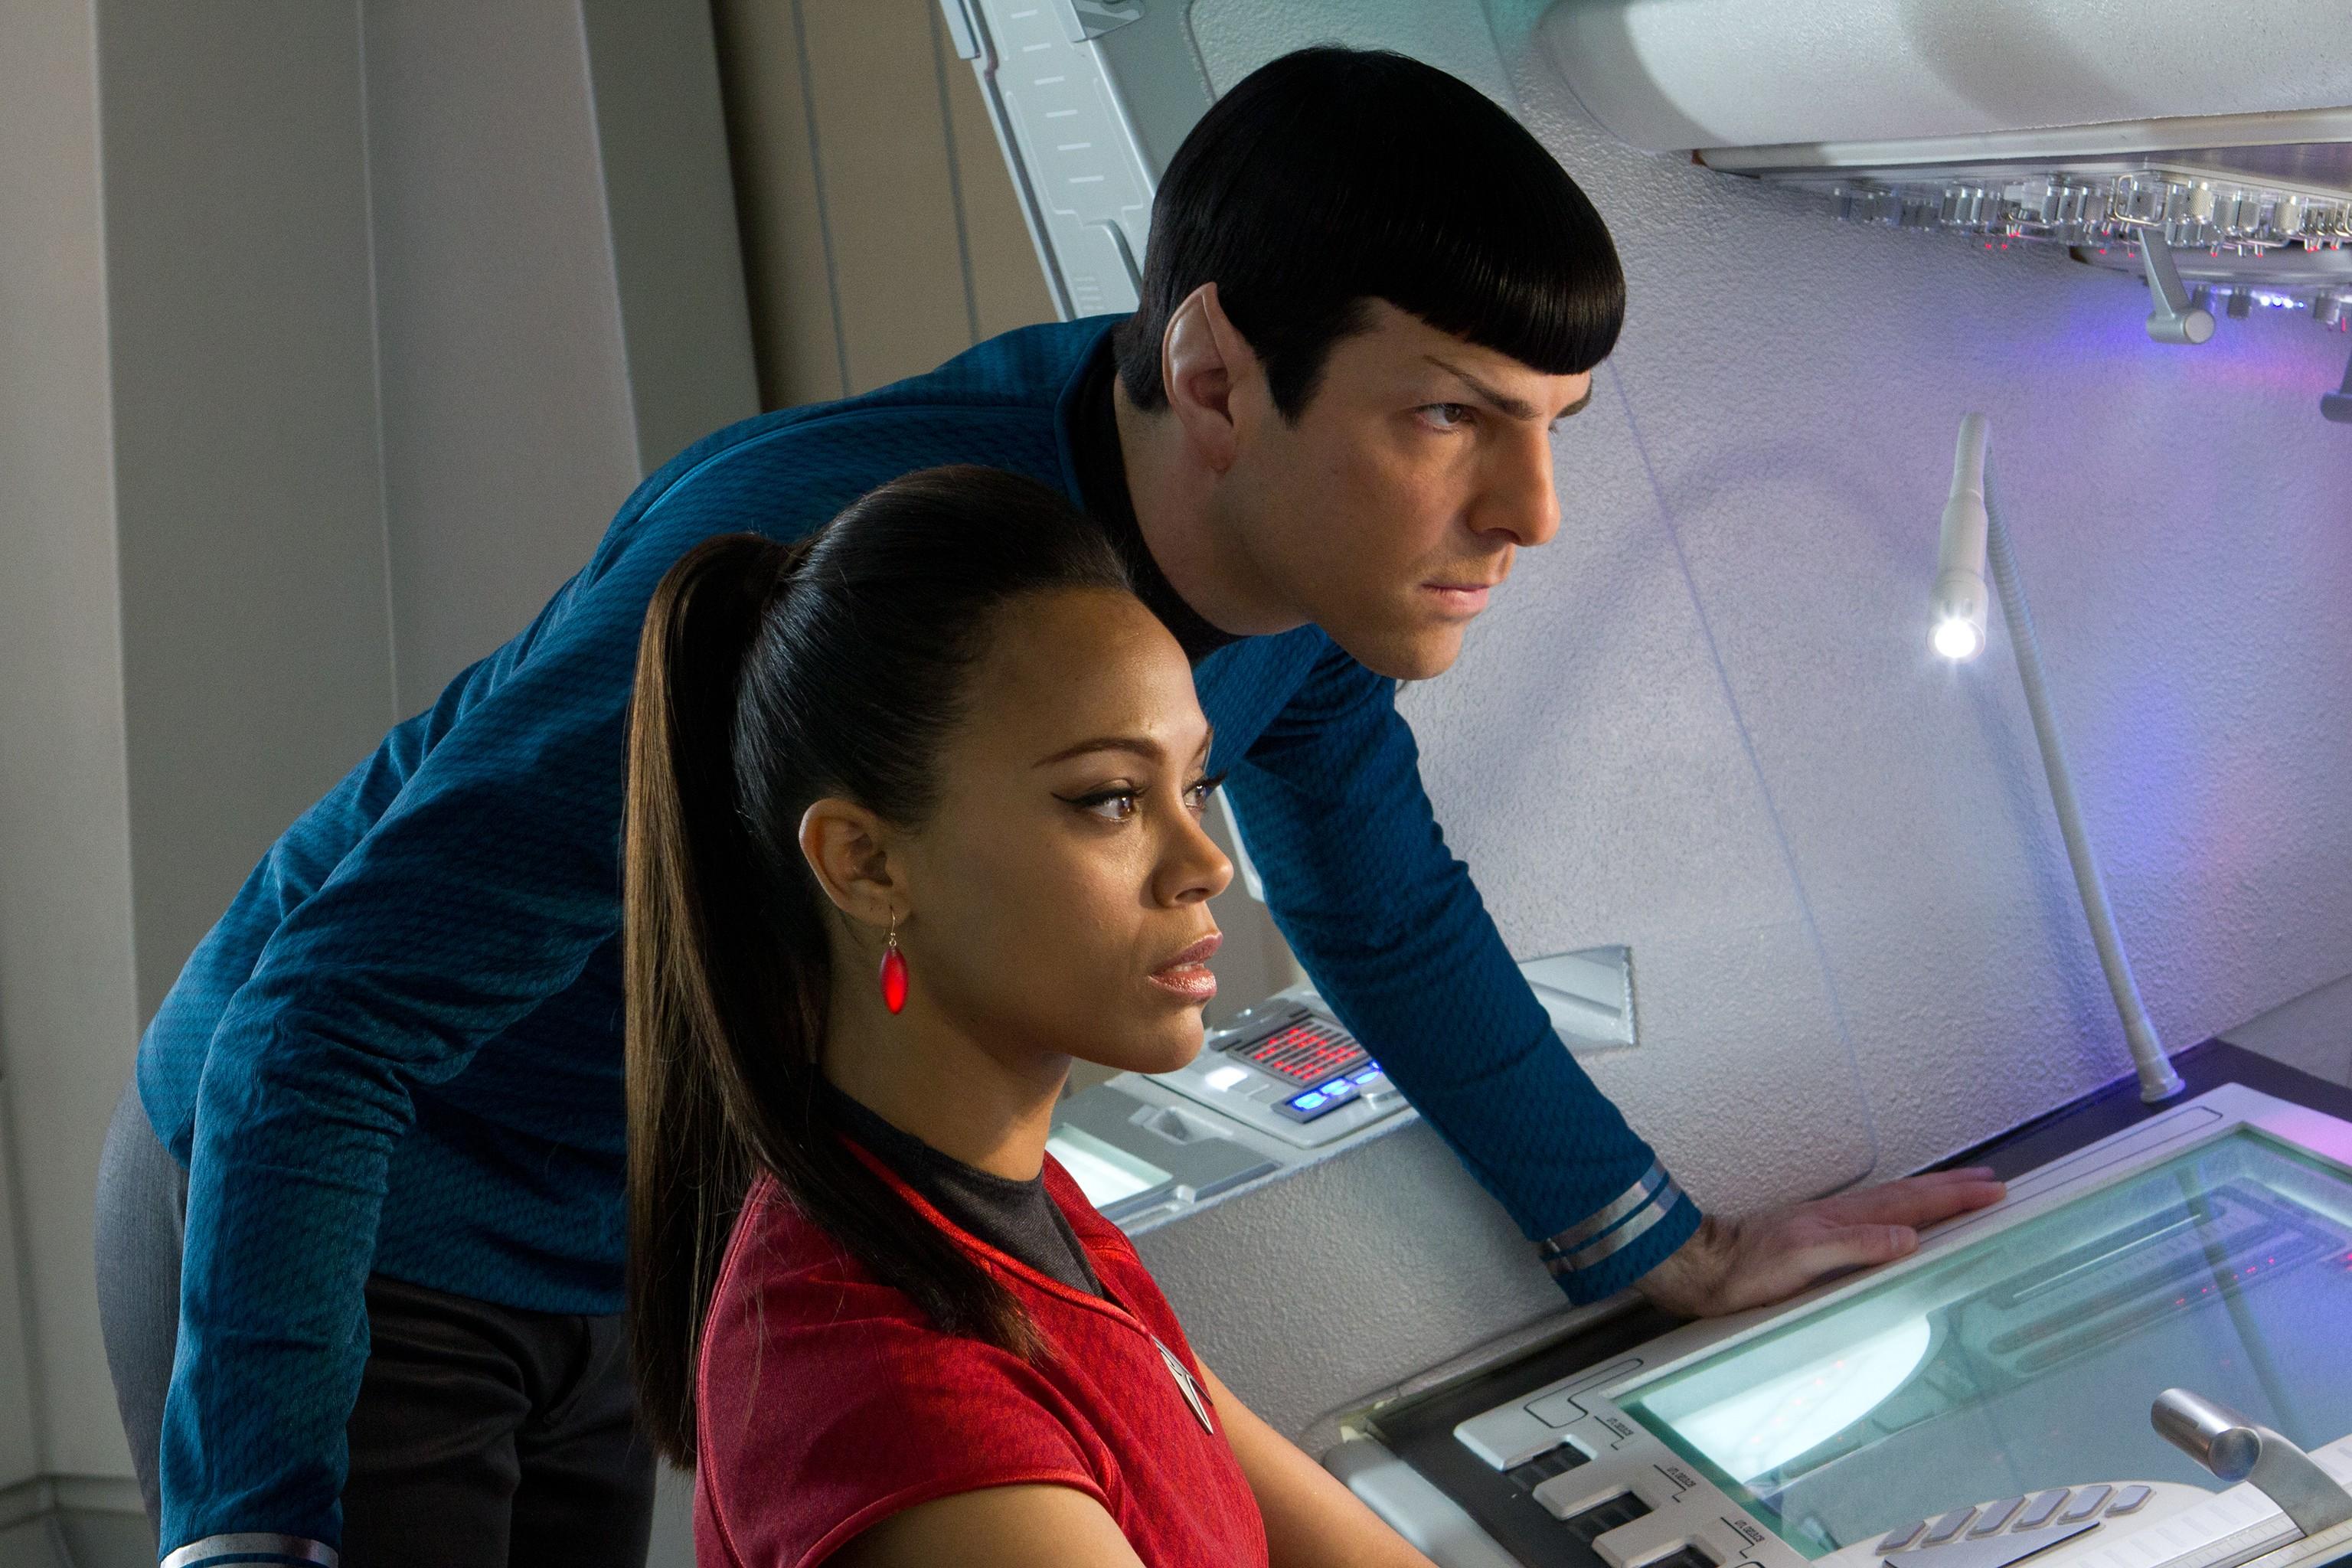 Spock & Uhura Star Trek into darkness HQ